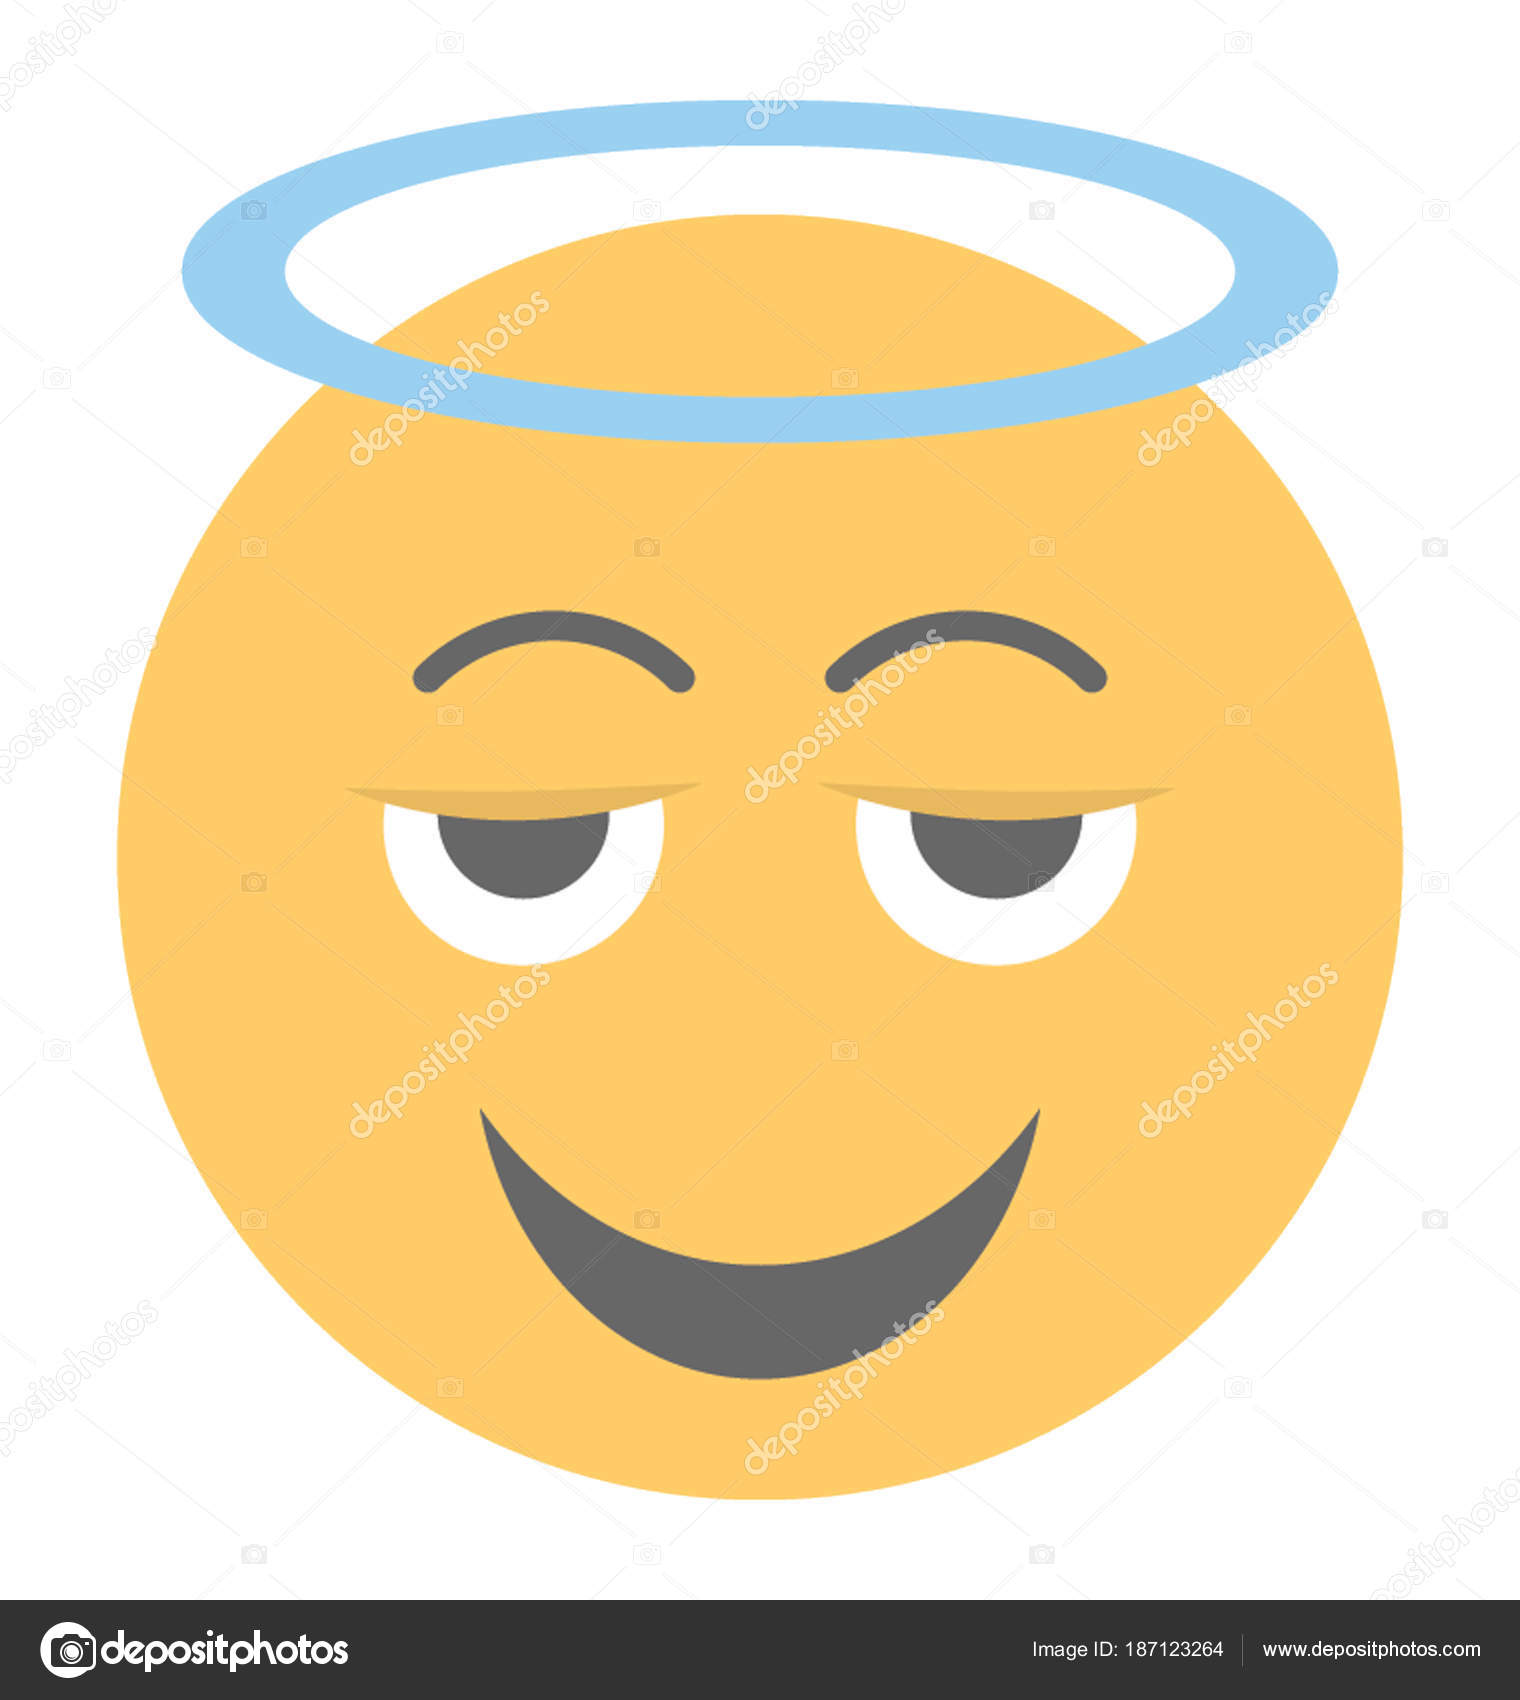 Smiley angel emoji